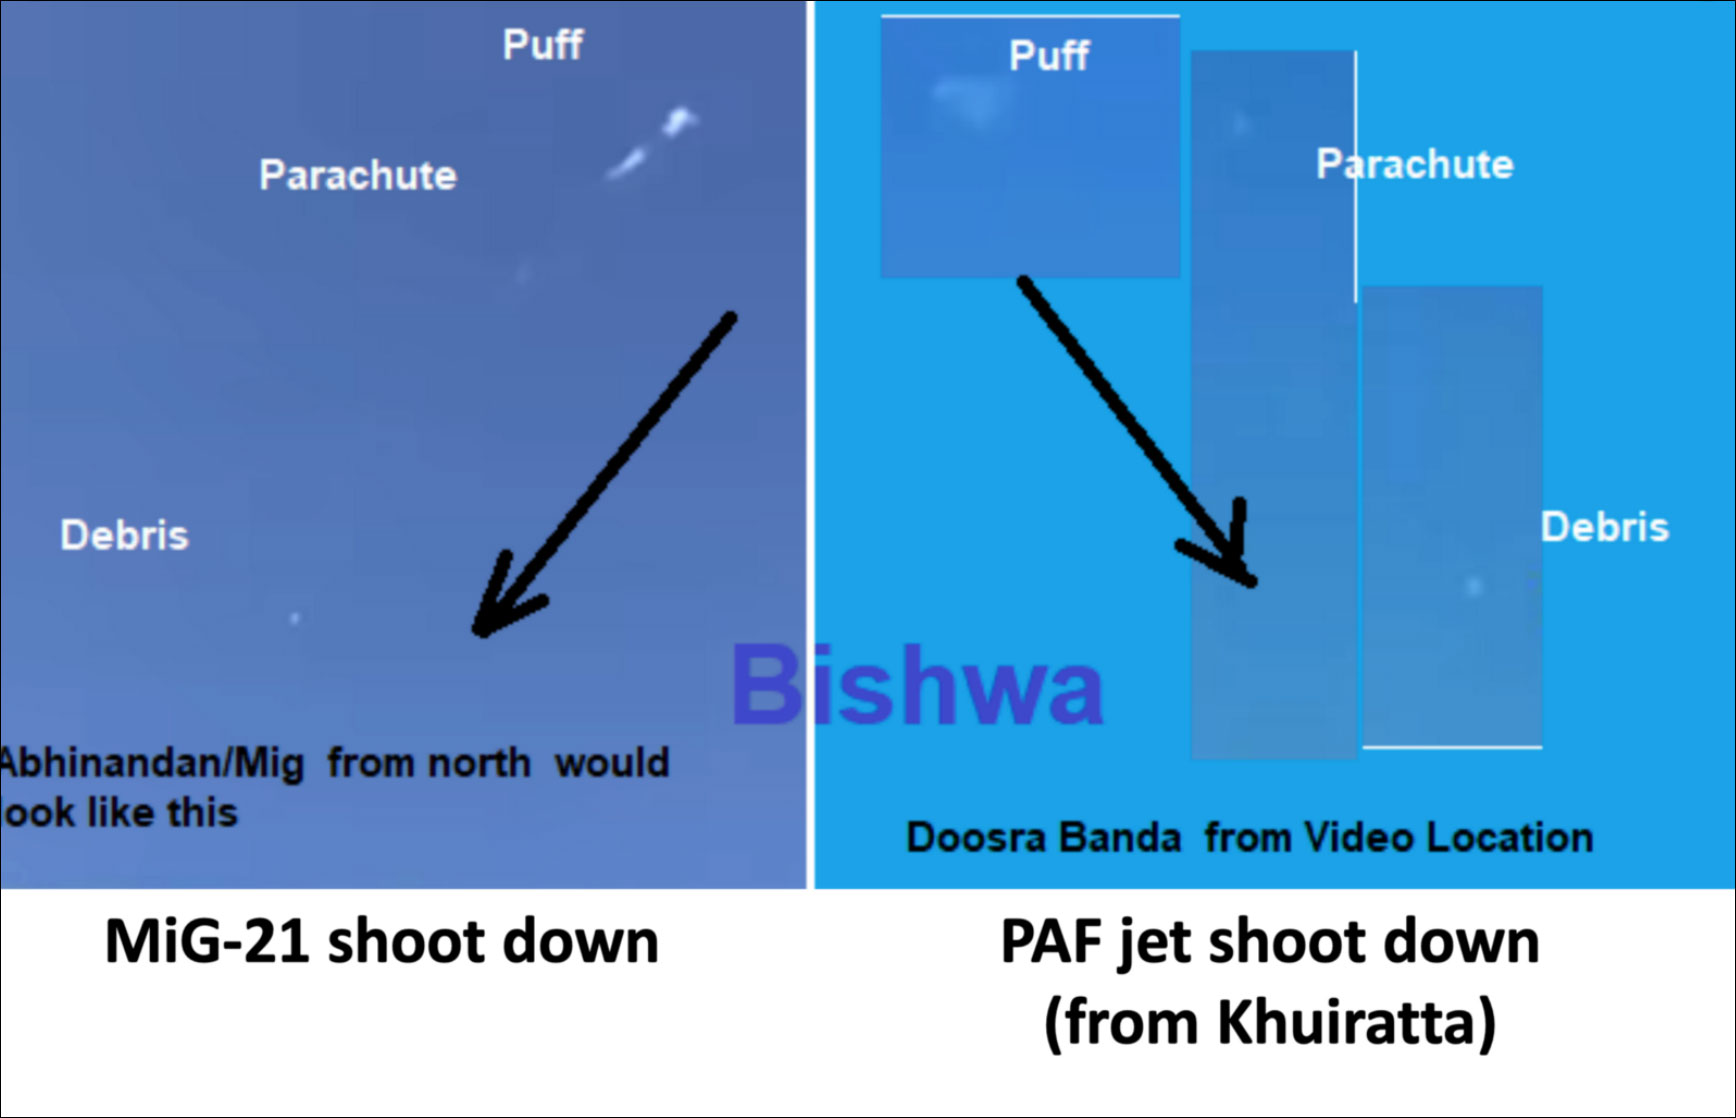 Using Open Source Intelligence (OSINT) to show how IAF's Abhinandan shot down a Pakistani F-16 39